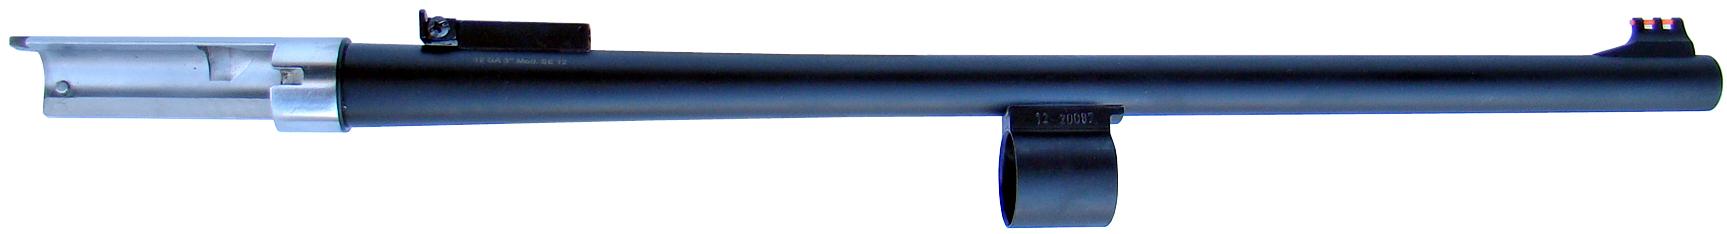 "Slug Barrel - Sporter Model 20ga - 20"" Smooth"